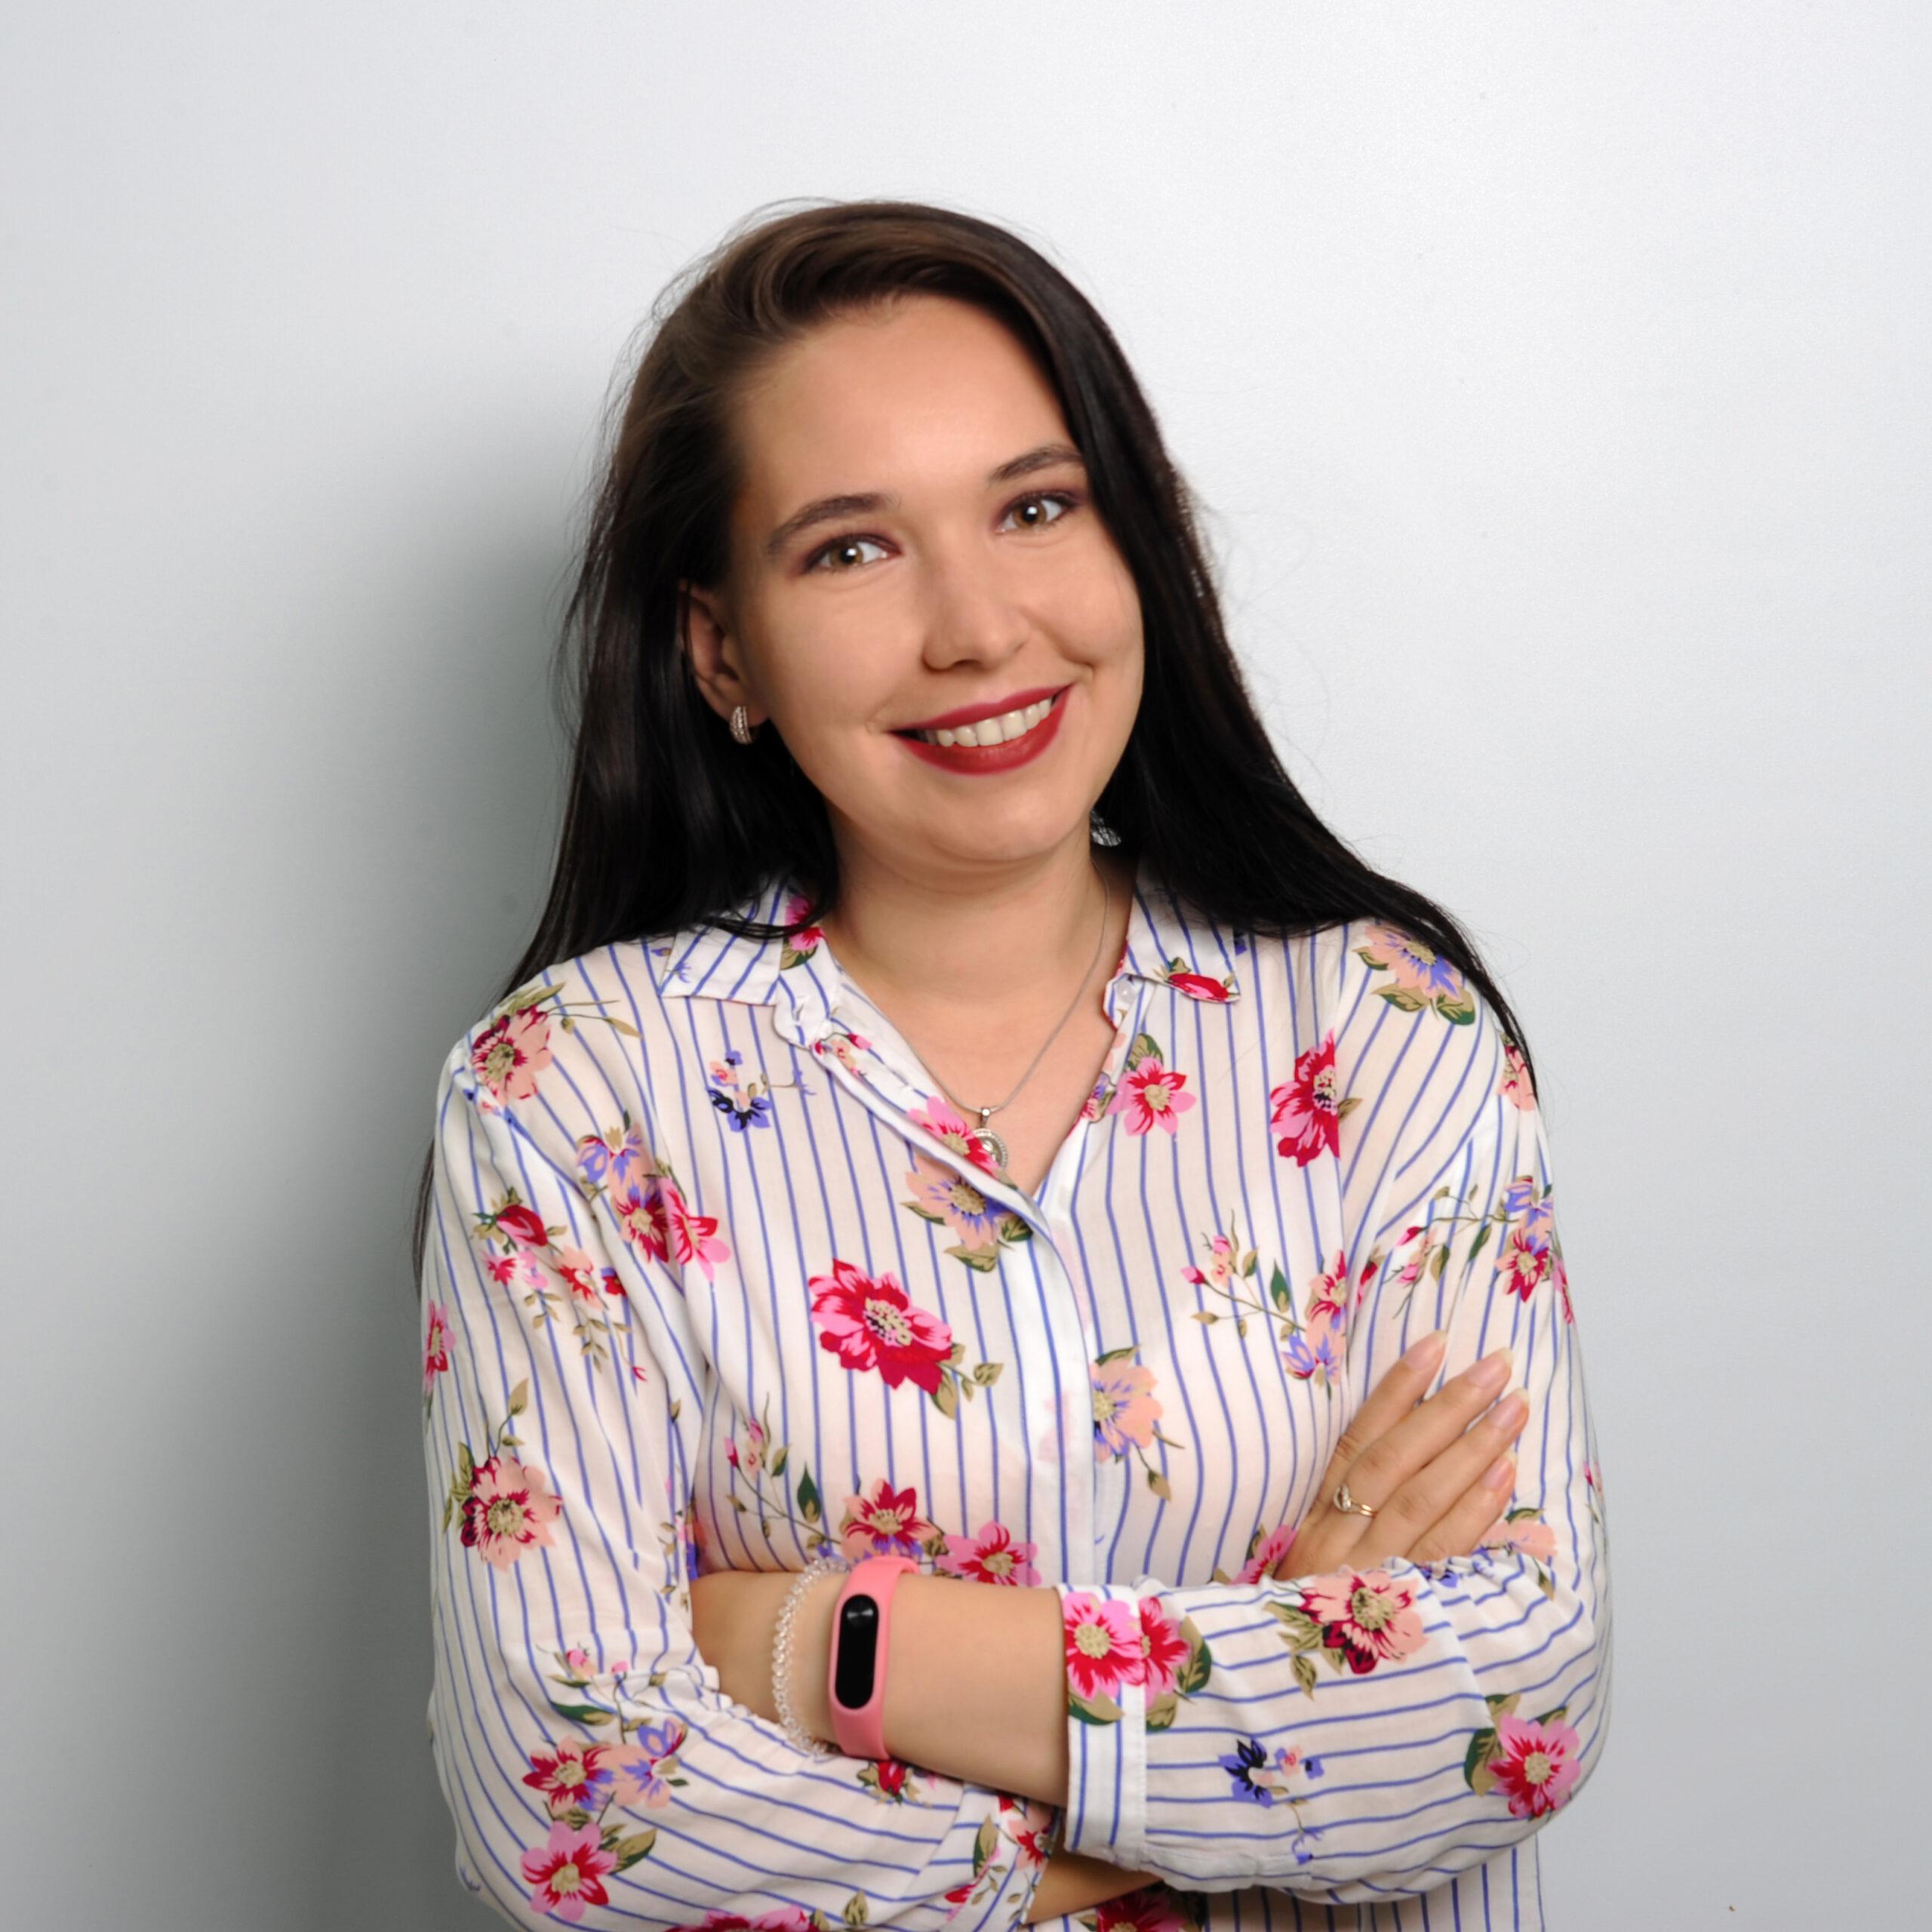 Maryna Khrolenko